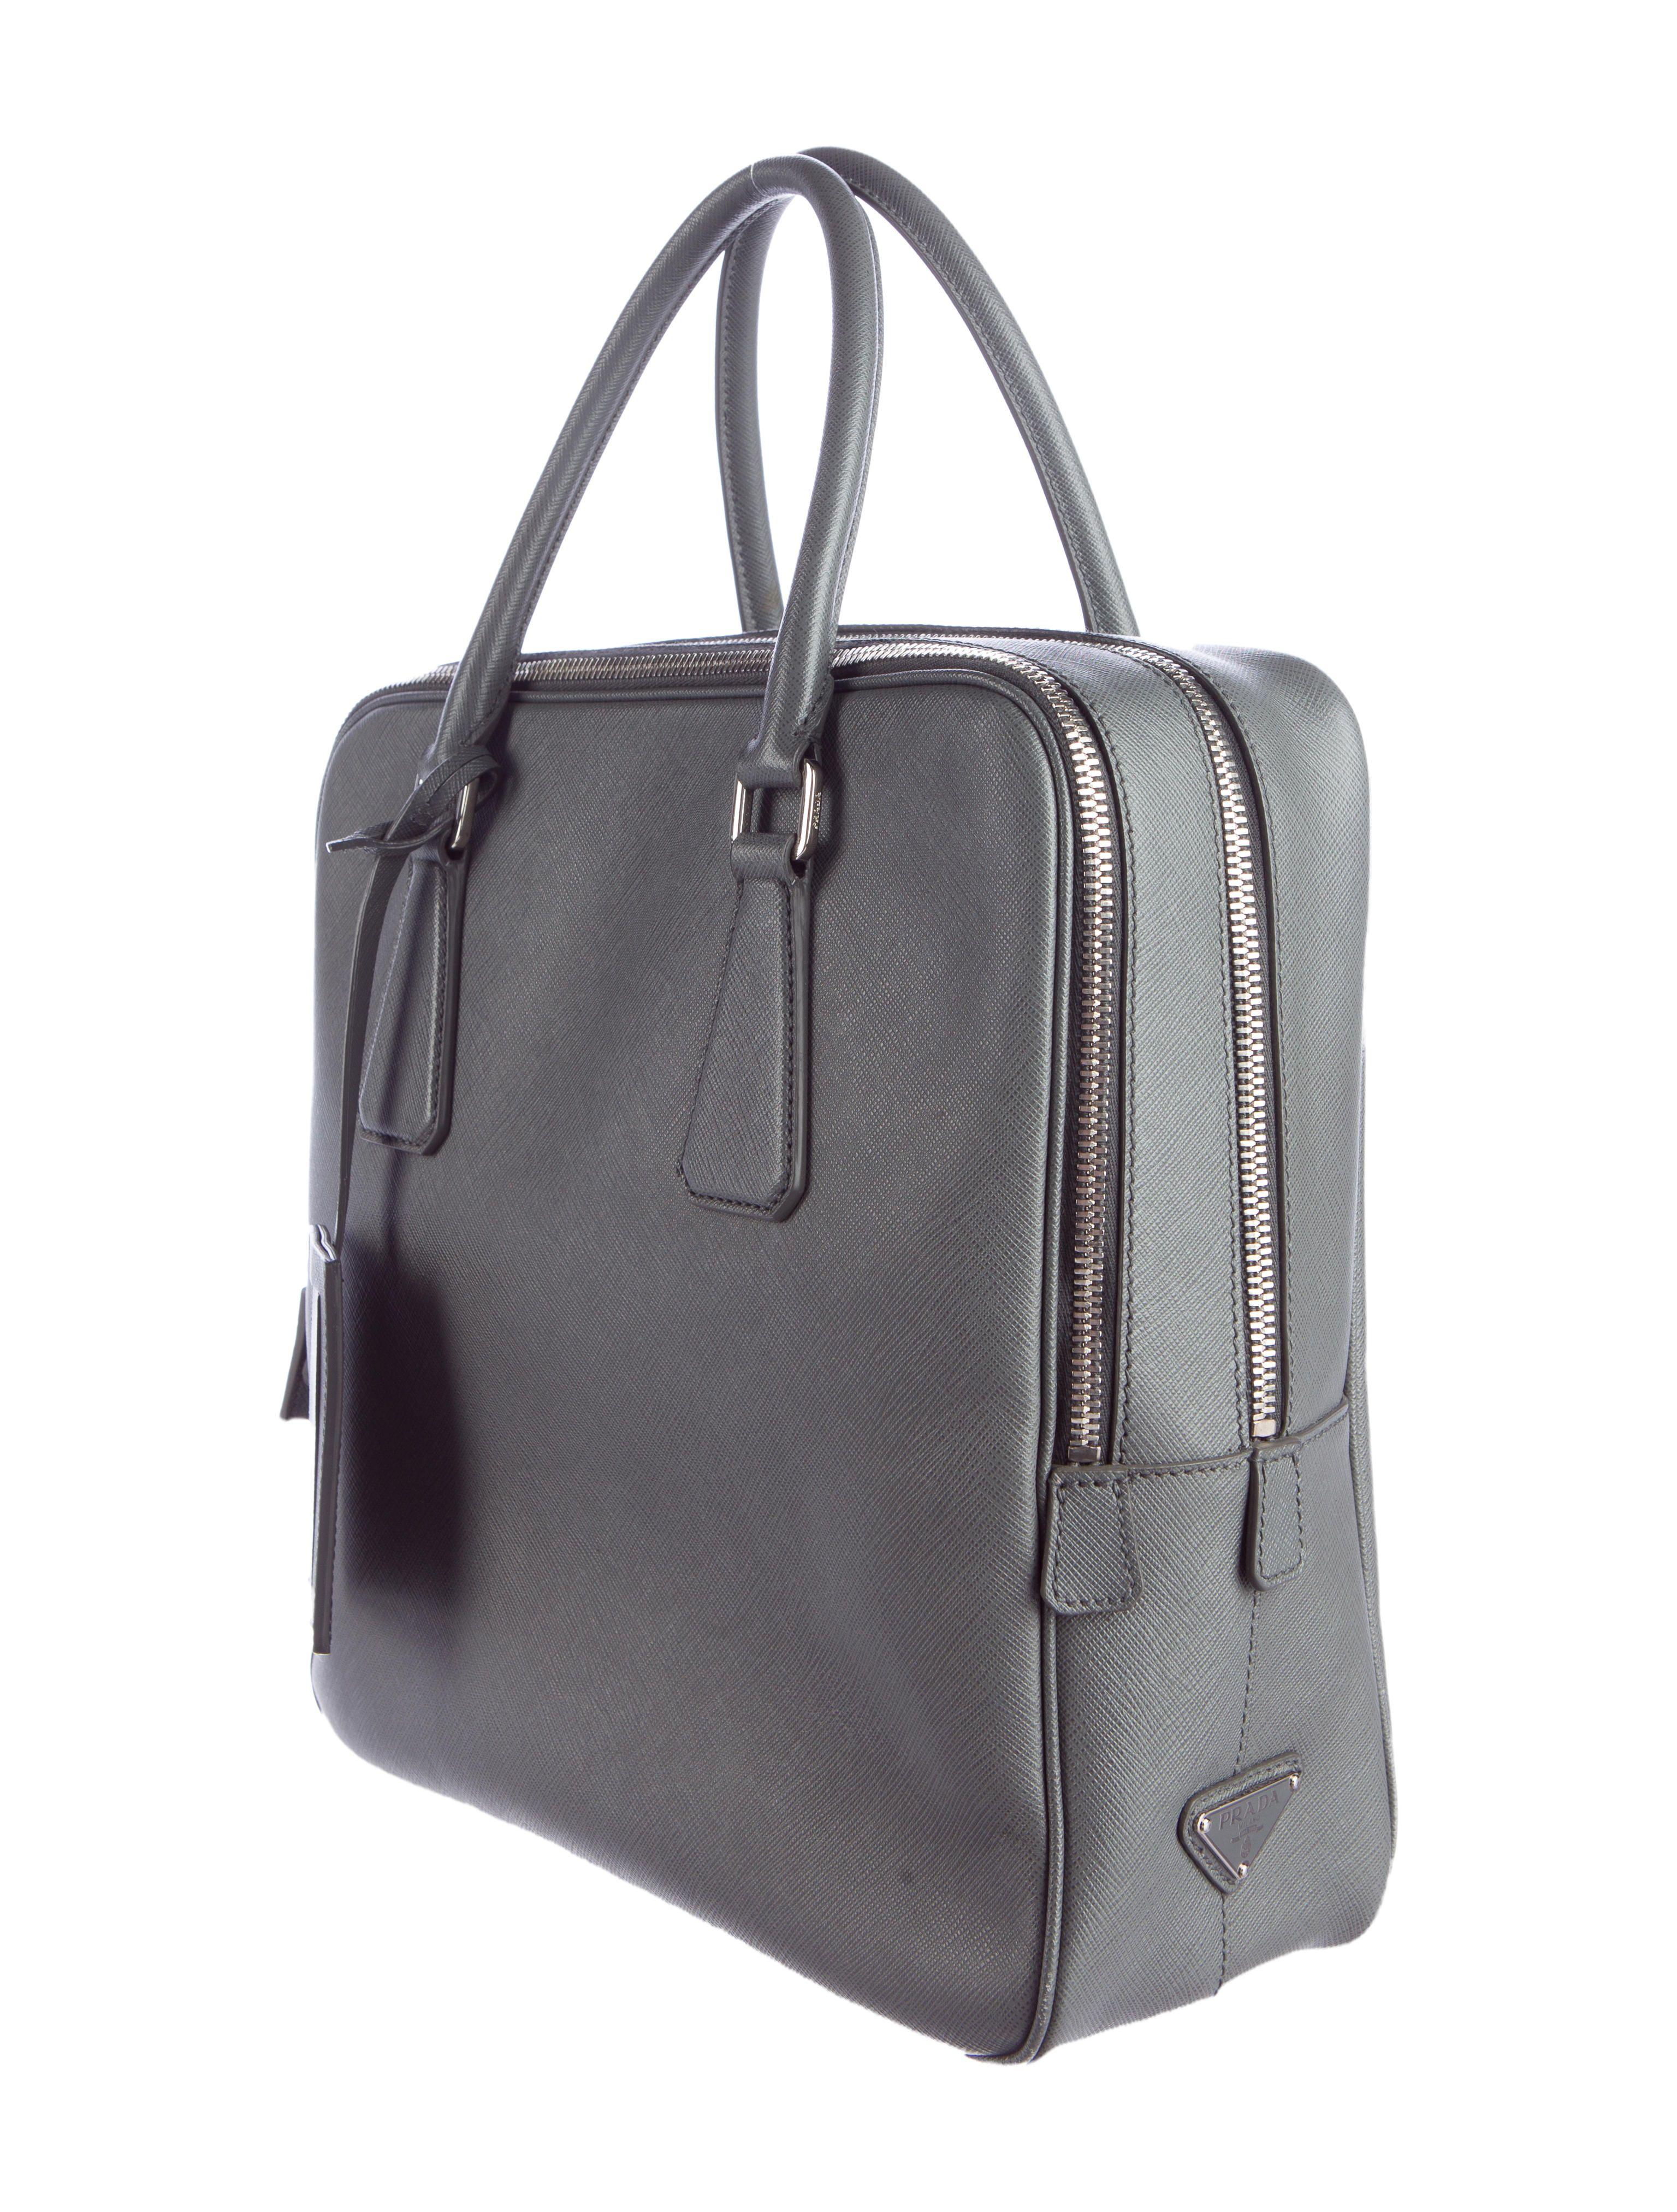 aadd9e007de6 Saffiano Top Handle Bag | Bags for manly men | Bags, Tops, Prada bag